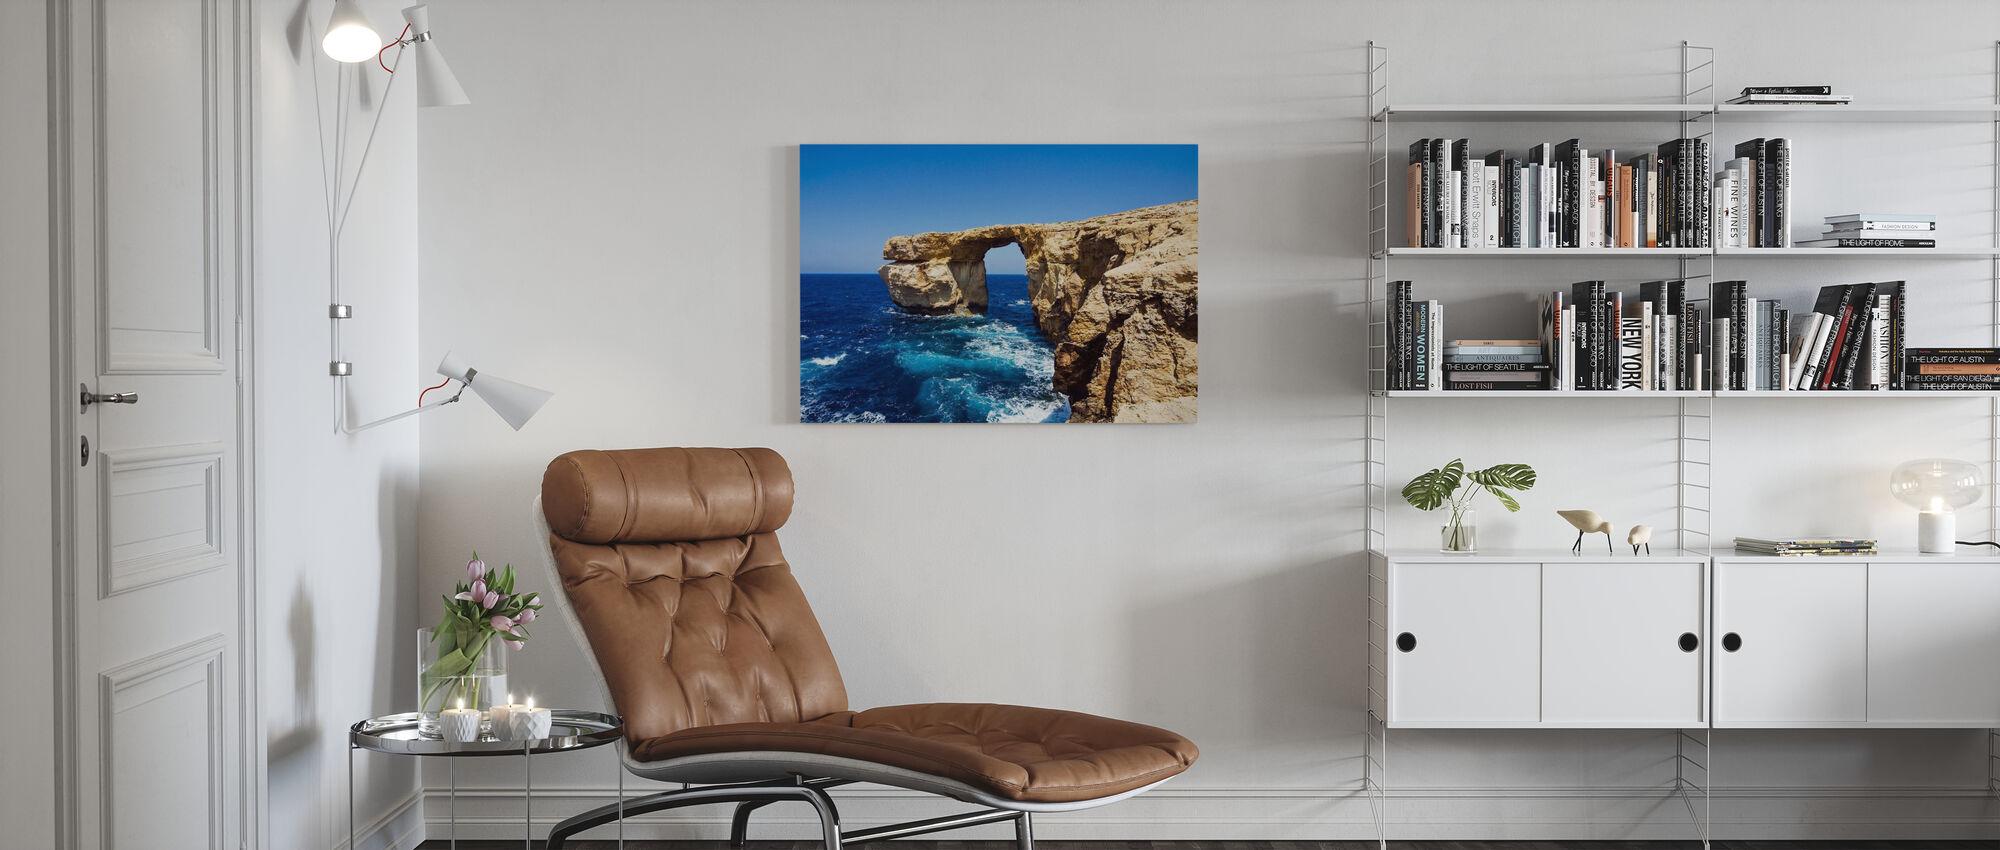 Azure-venster - Canvas print - Woonkamer